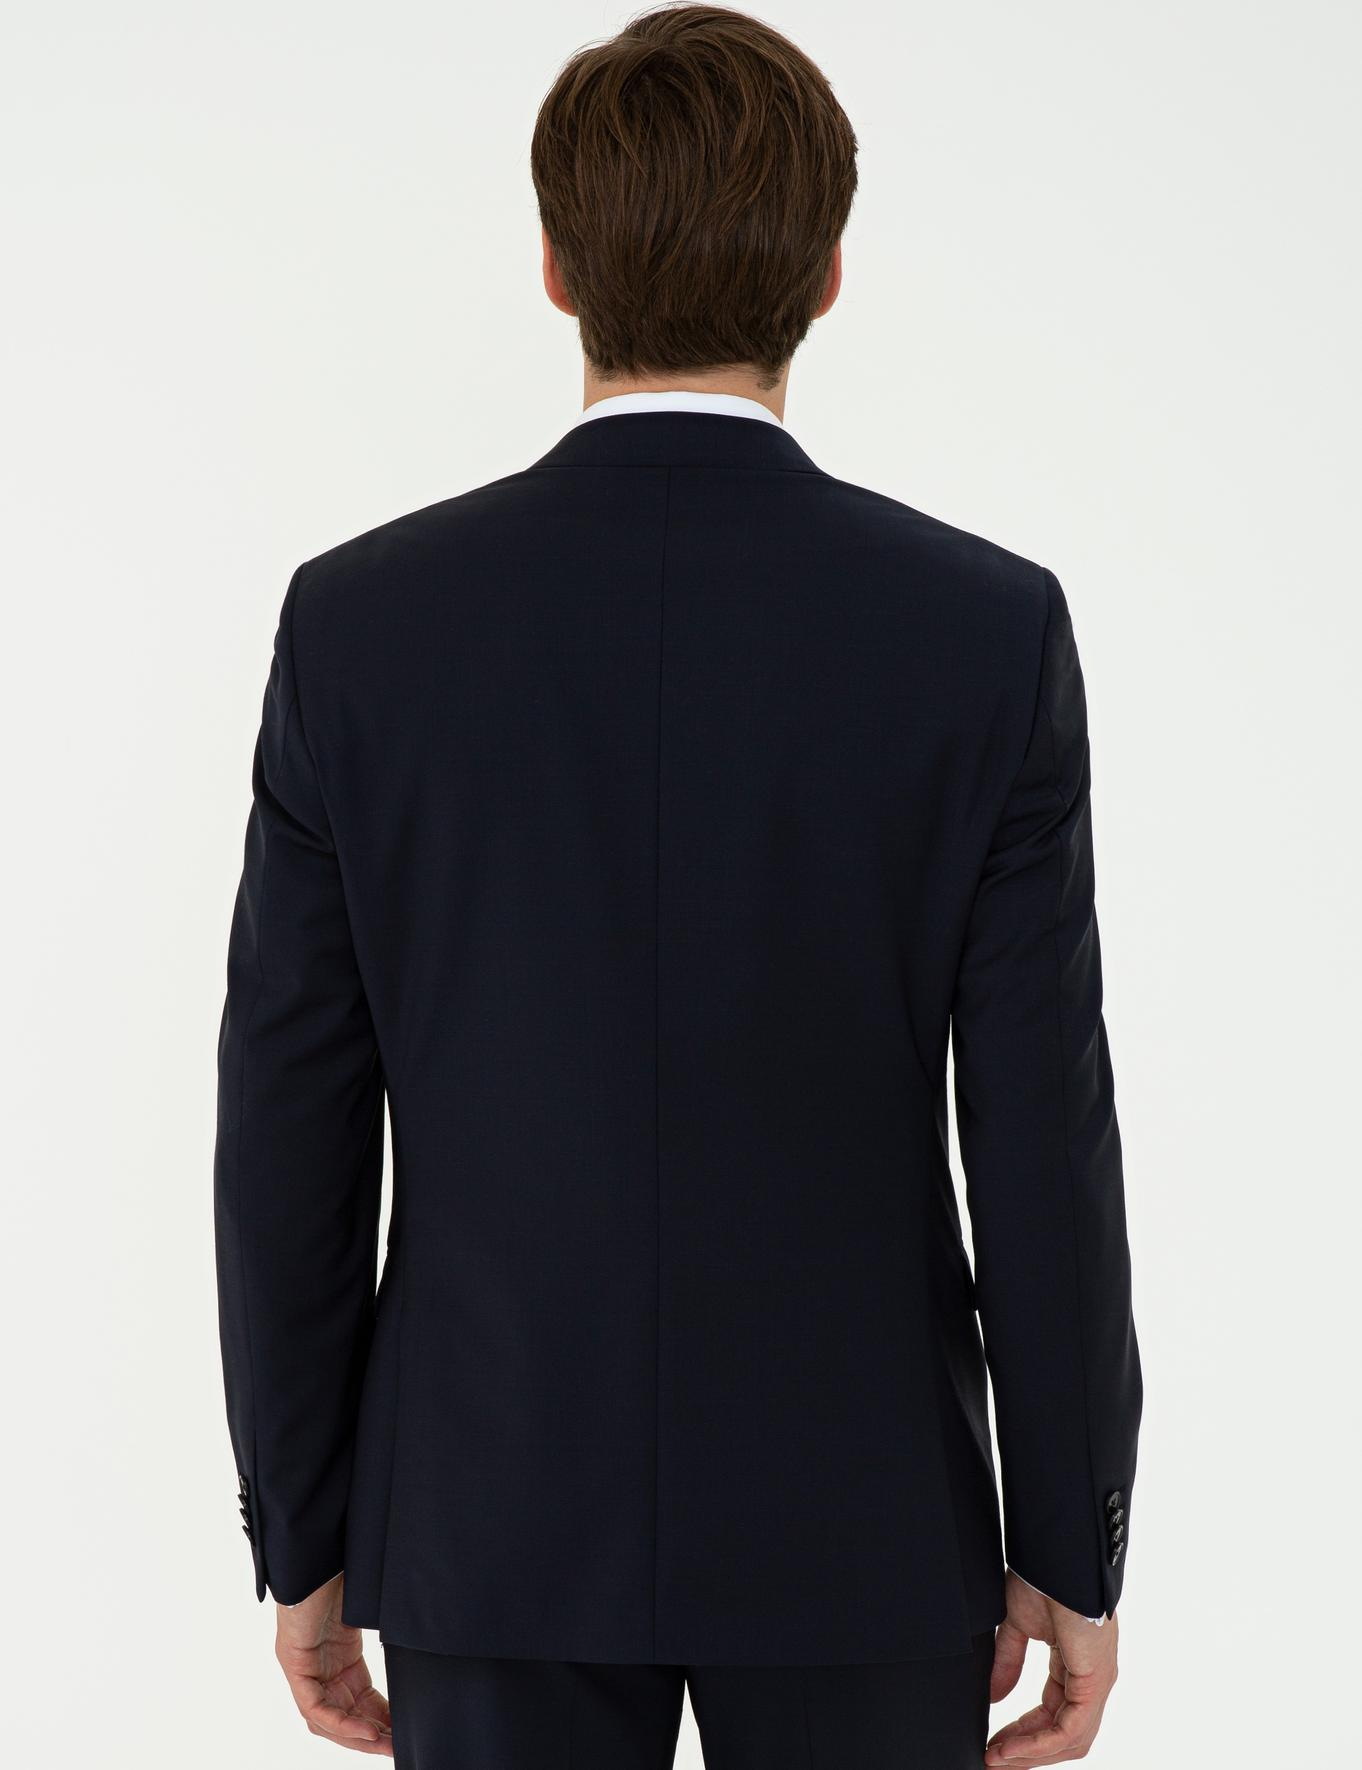 Lacivert Slim Fit Ceket - 50235695011